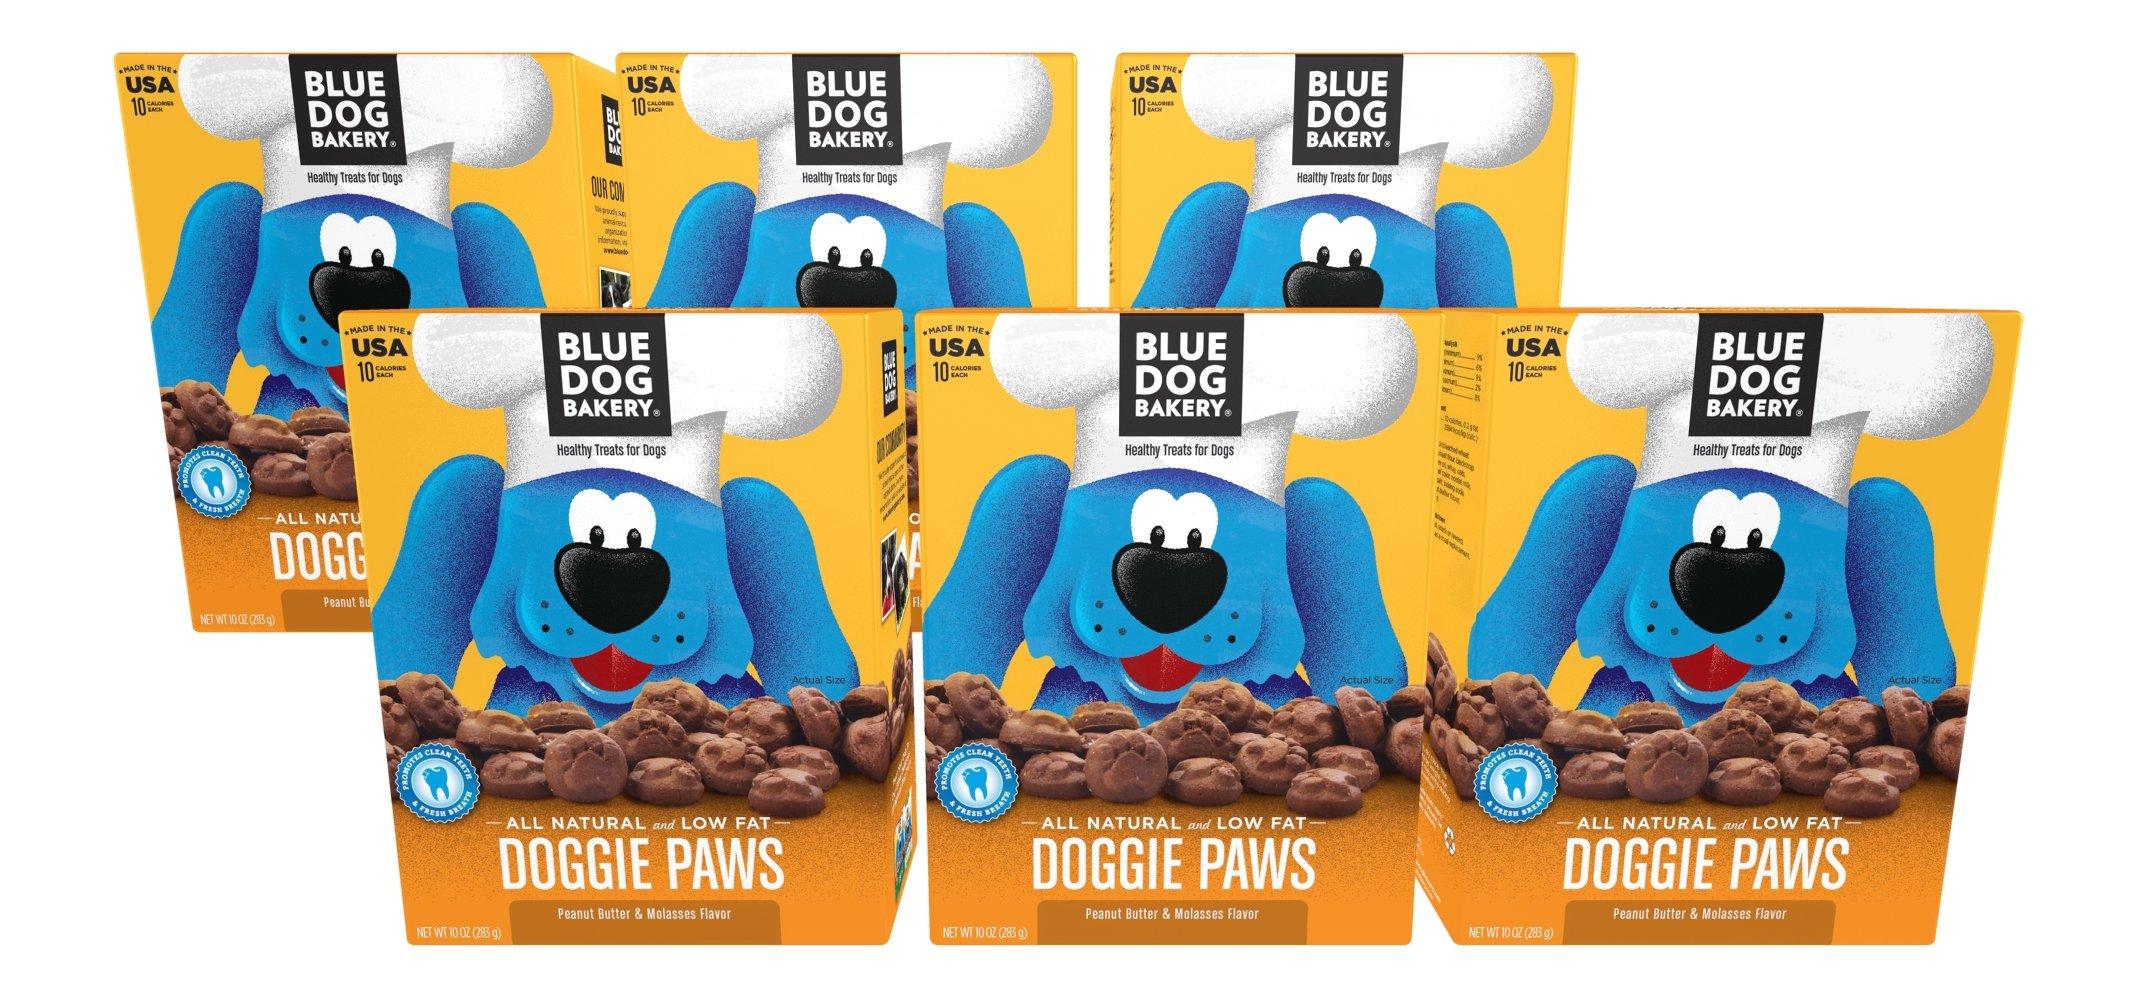 Blue Dog Bakery   Dog Treats   All-Natural   Peanut Butter & Molasses